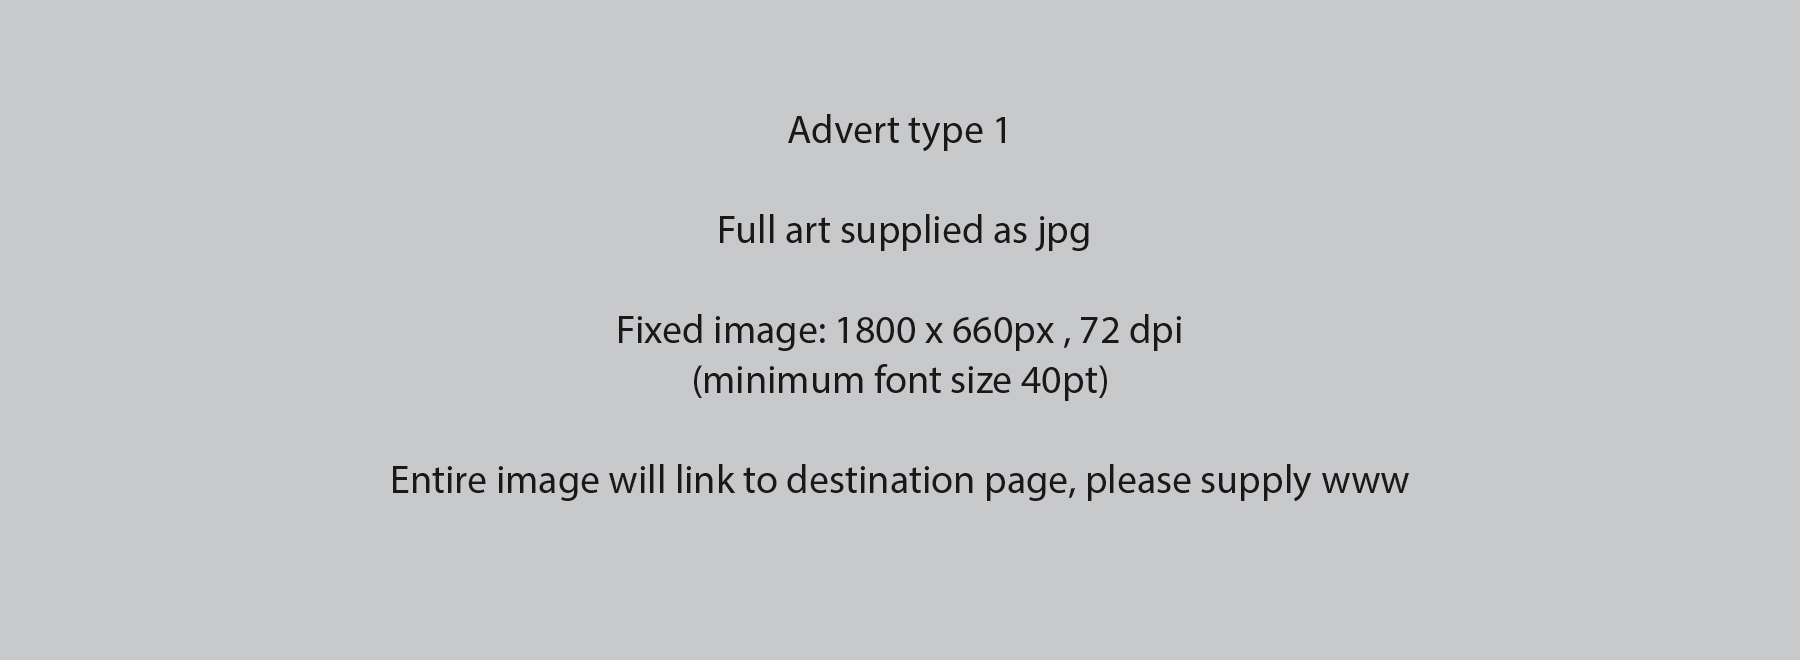 advert test 1800x660.jpg